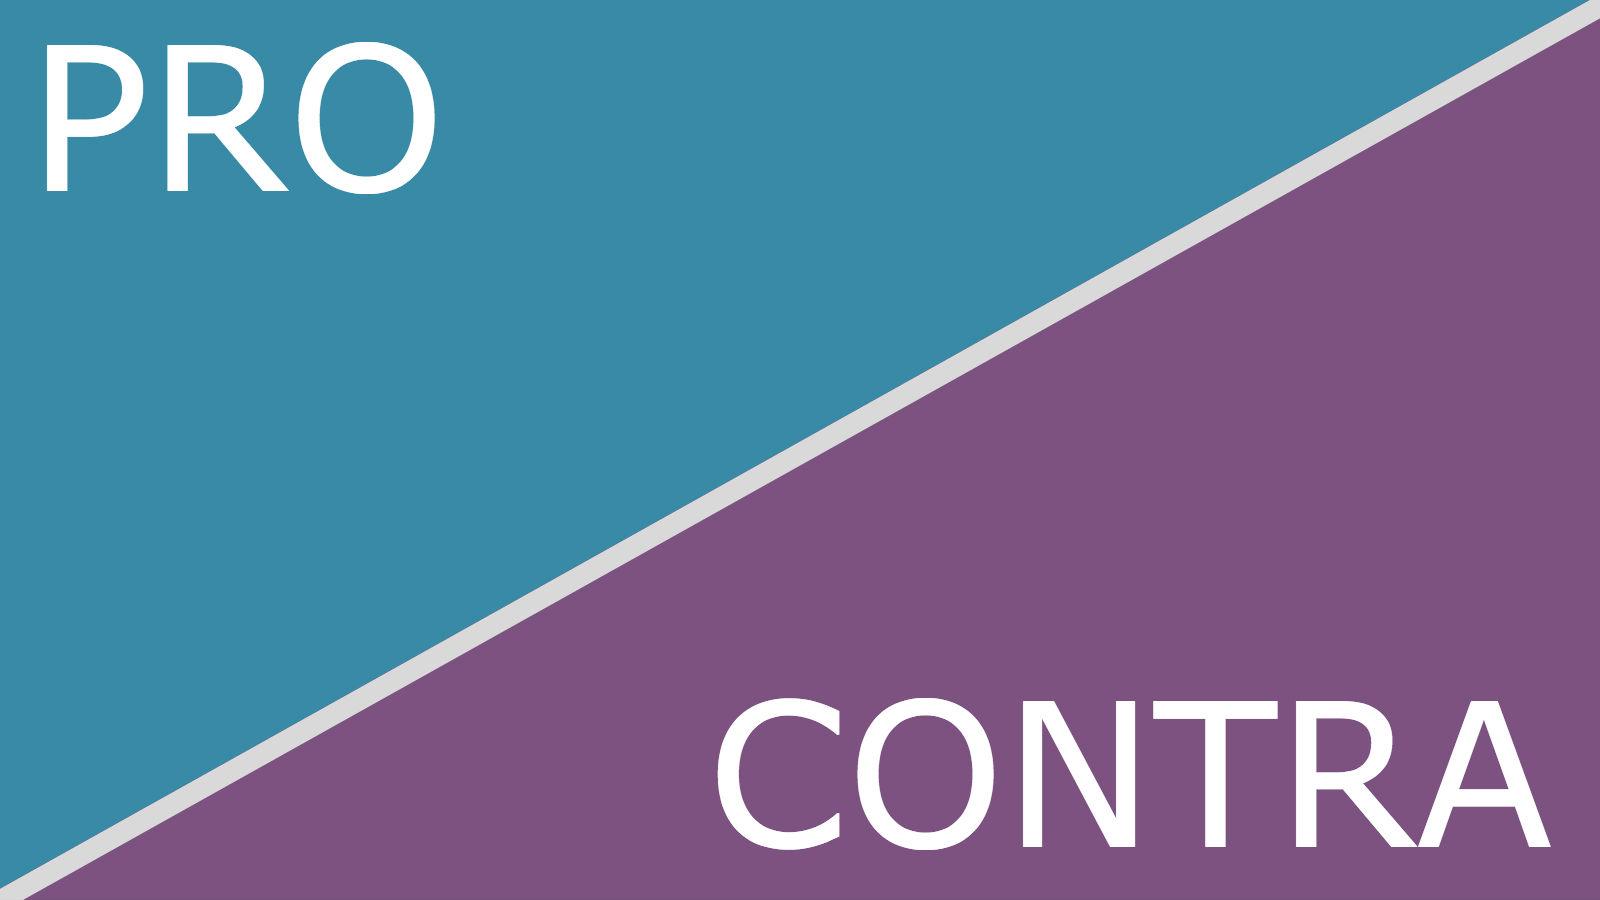 Pro Contra